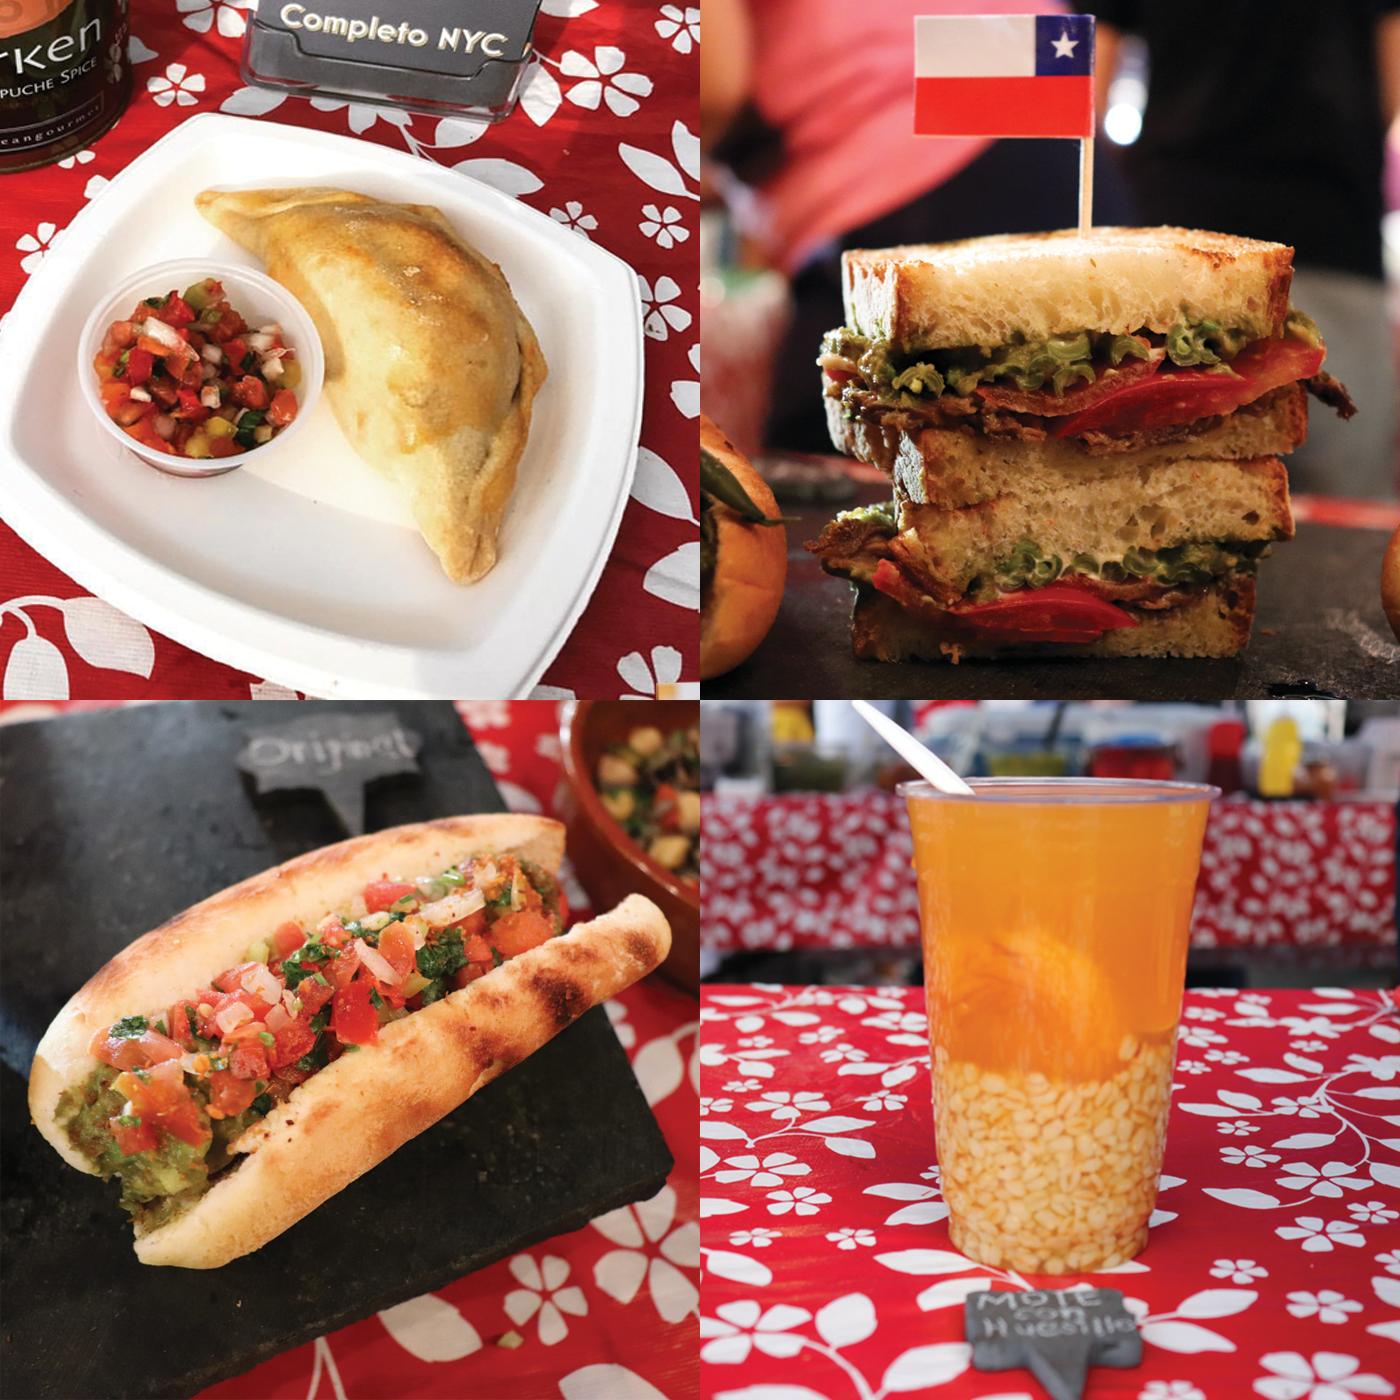 Clockwise from top left: Baked Empanada de Pino, Chacarero, Mote con Huesillo, Completo.